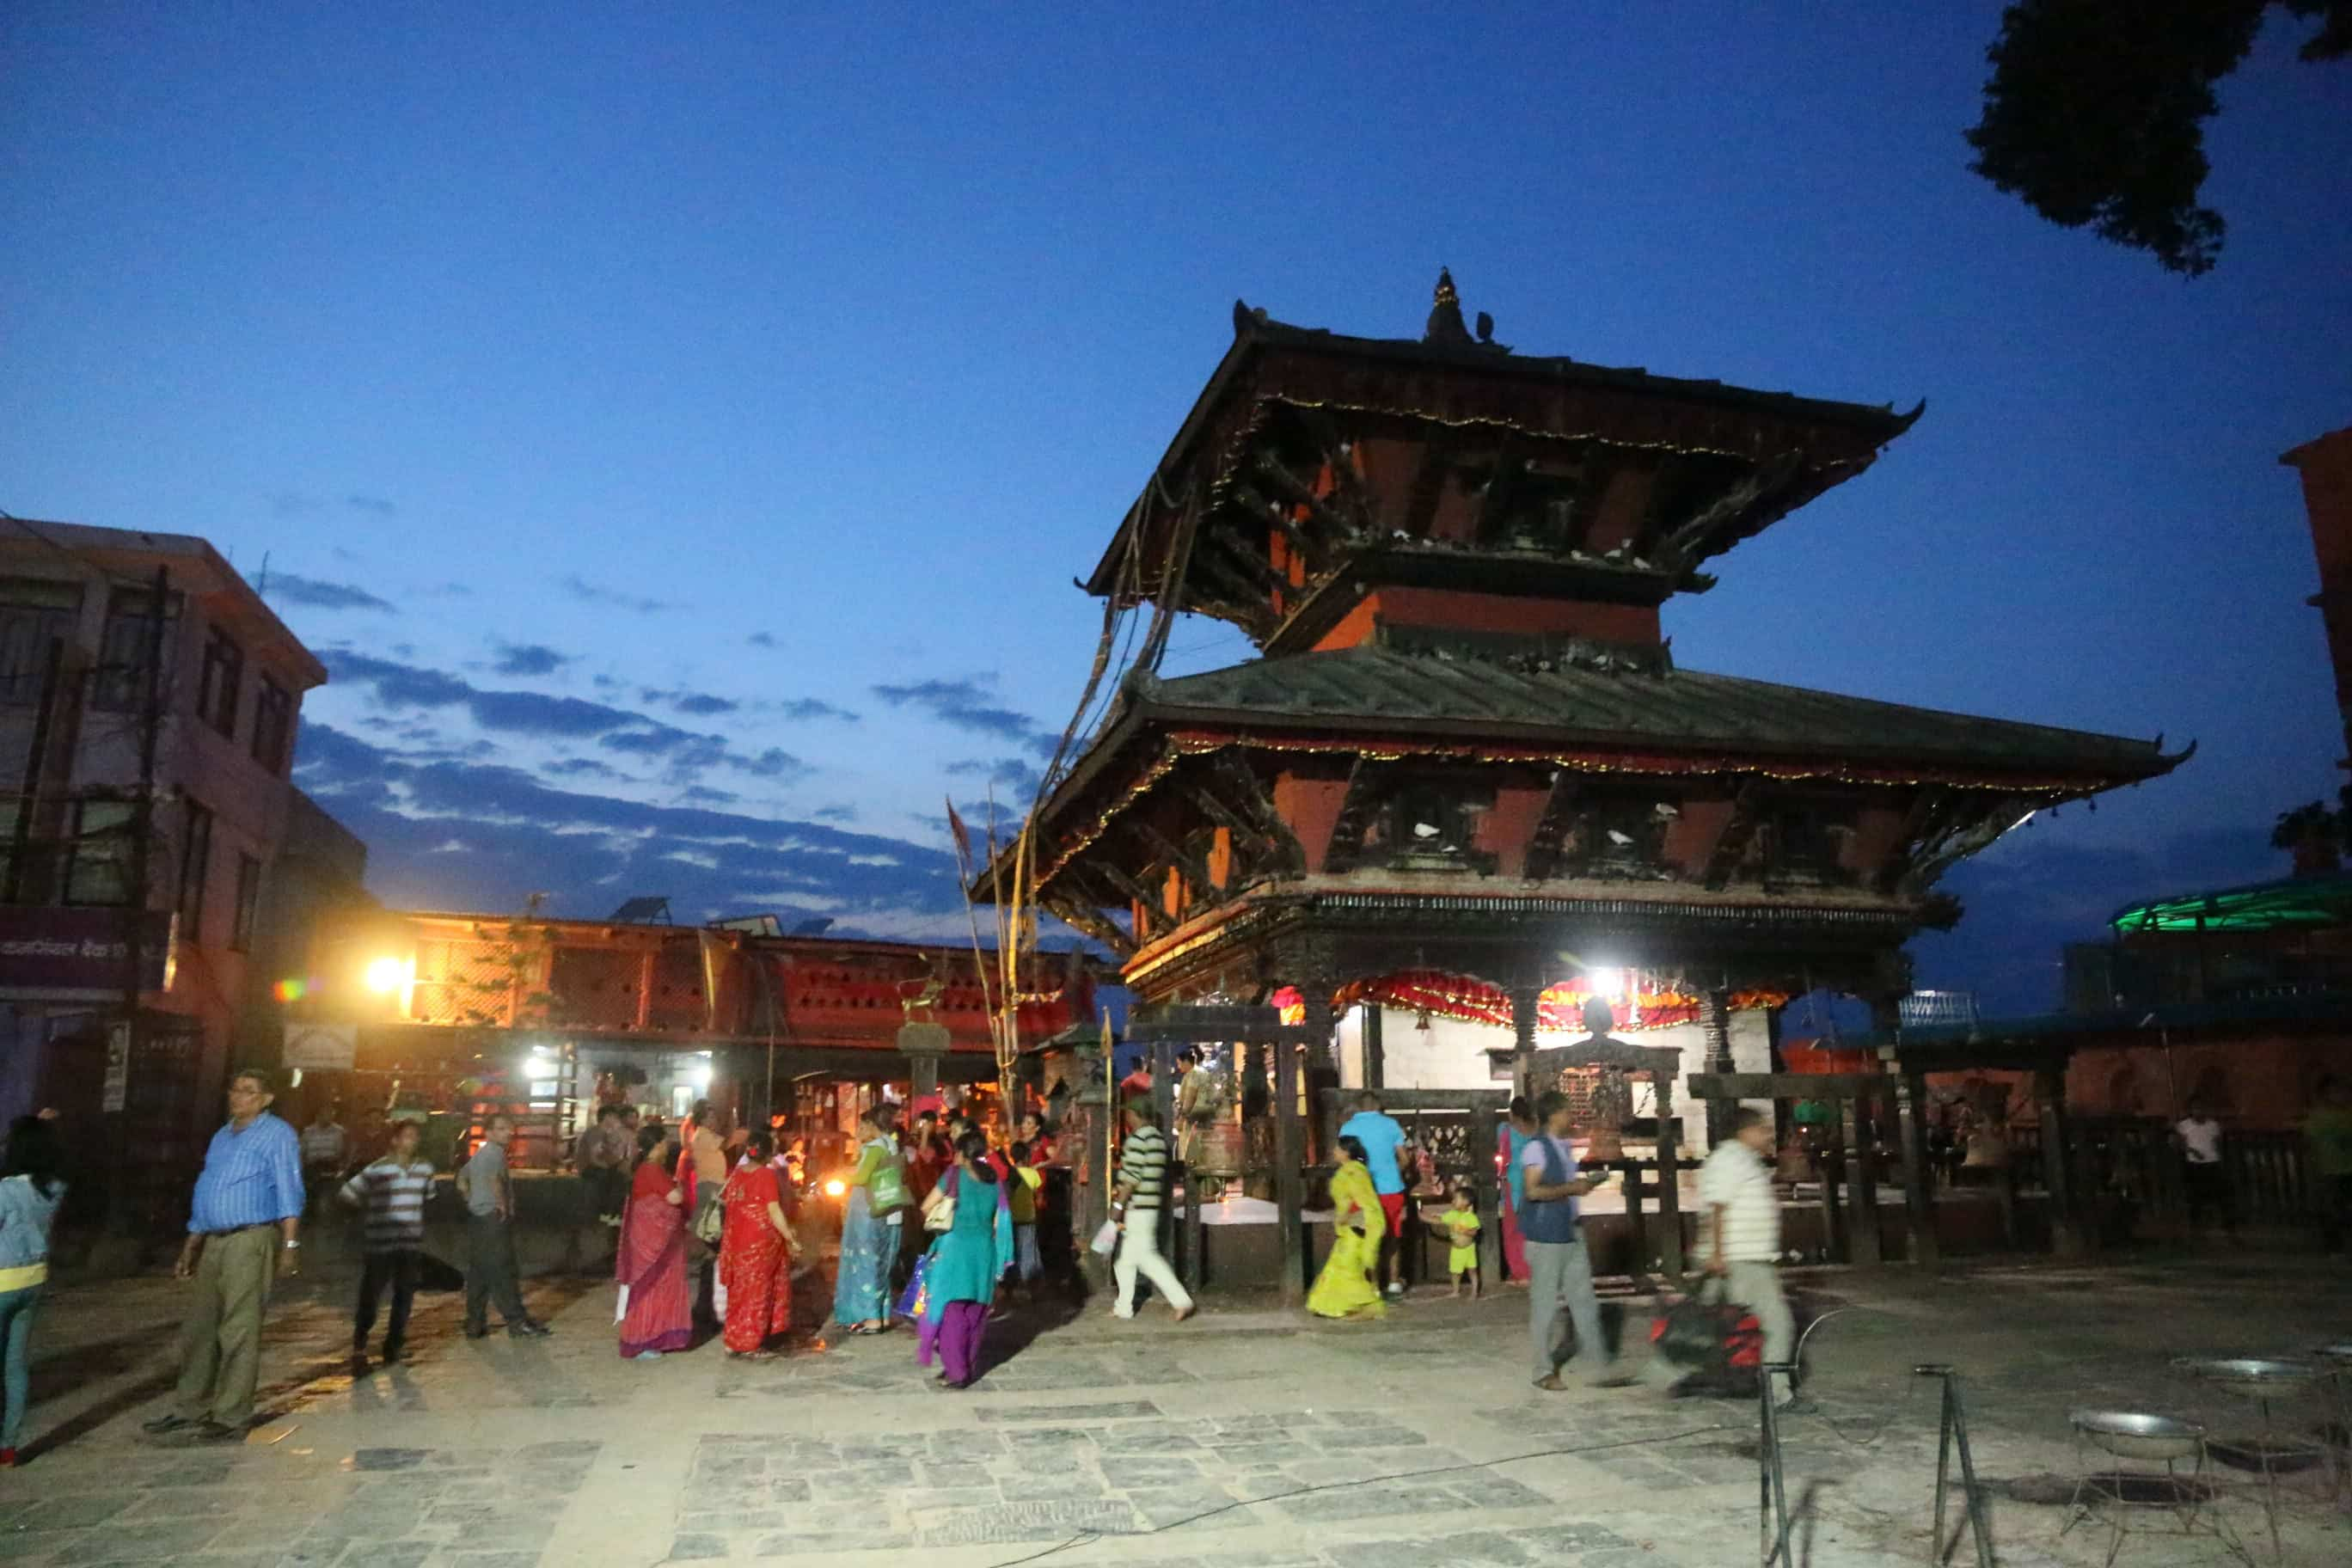 Hindu Pilgrimage Tour in Nepal- Manakamana Temple